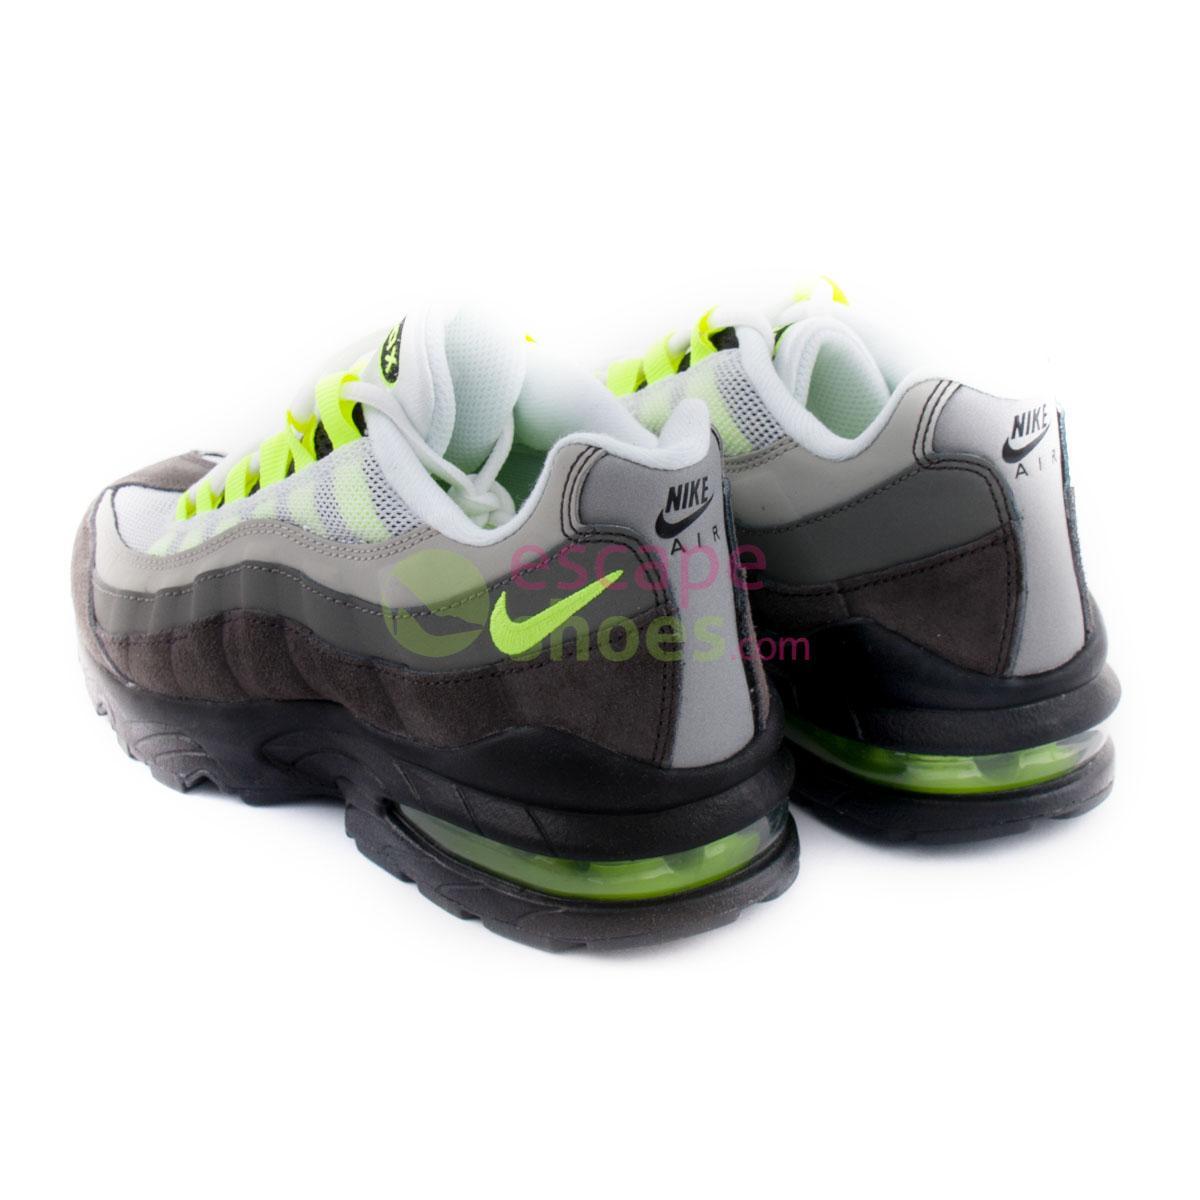 Sneakers NIKE Air Max 95 Gs Black Volt Ash Pewter 307565 077